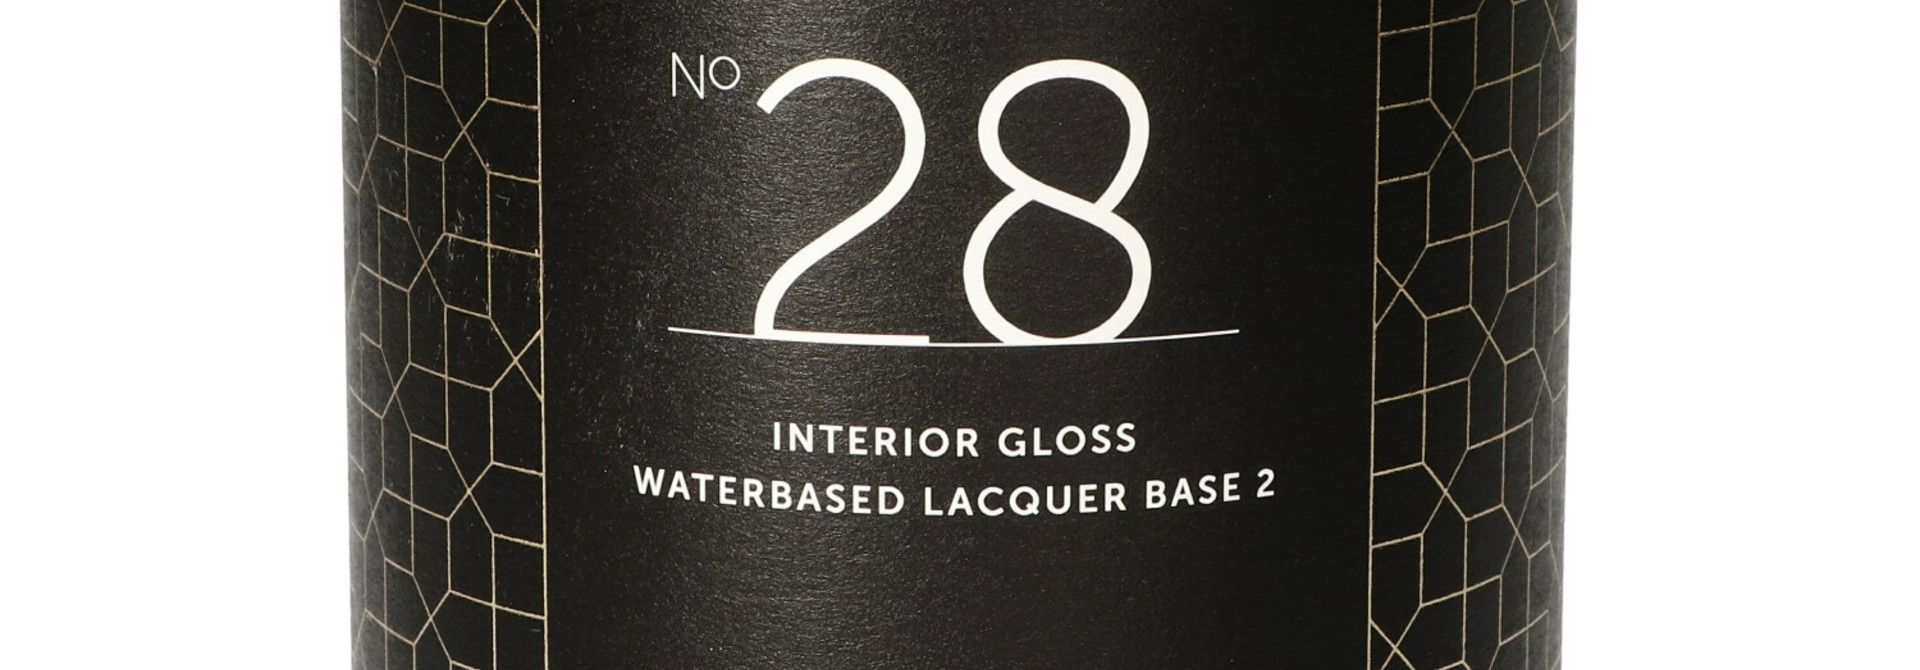 No. 28 INTERIOR GLOSS - 1L